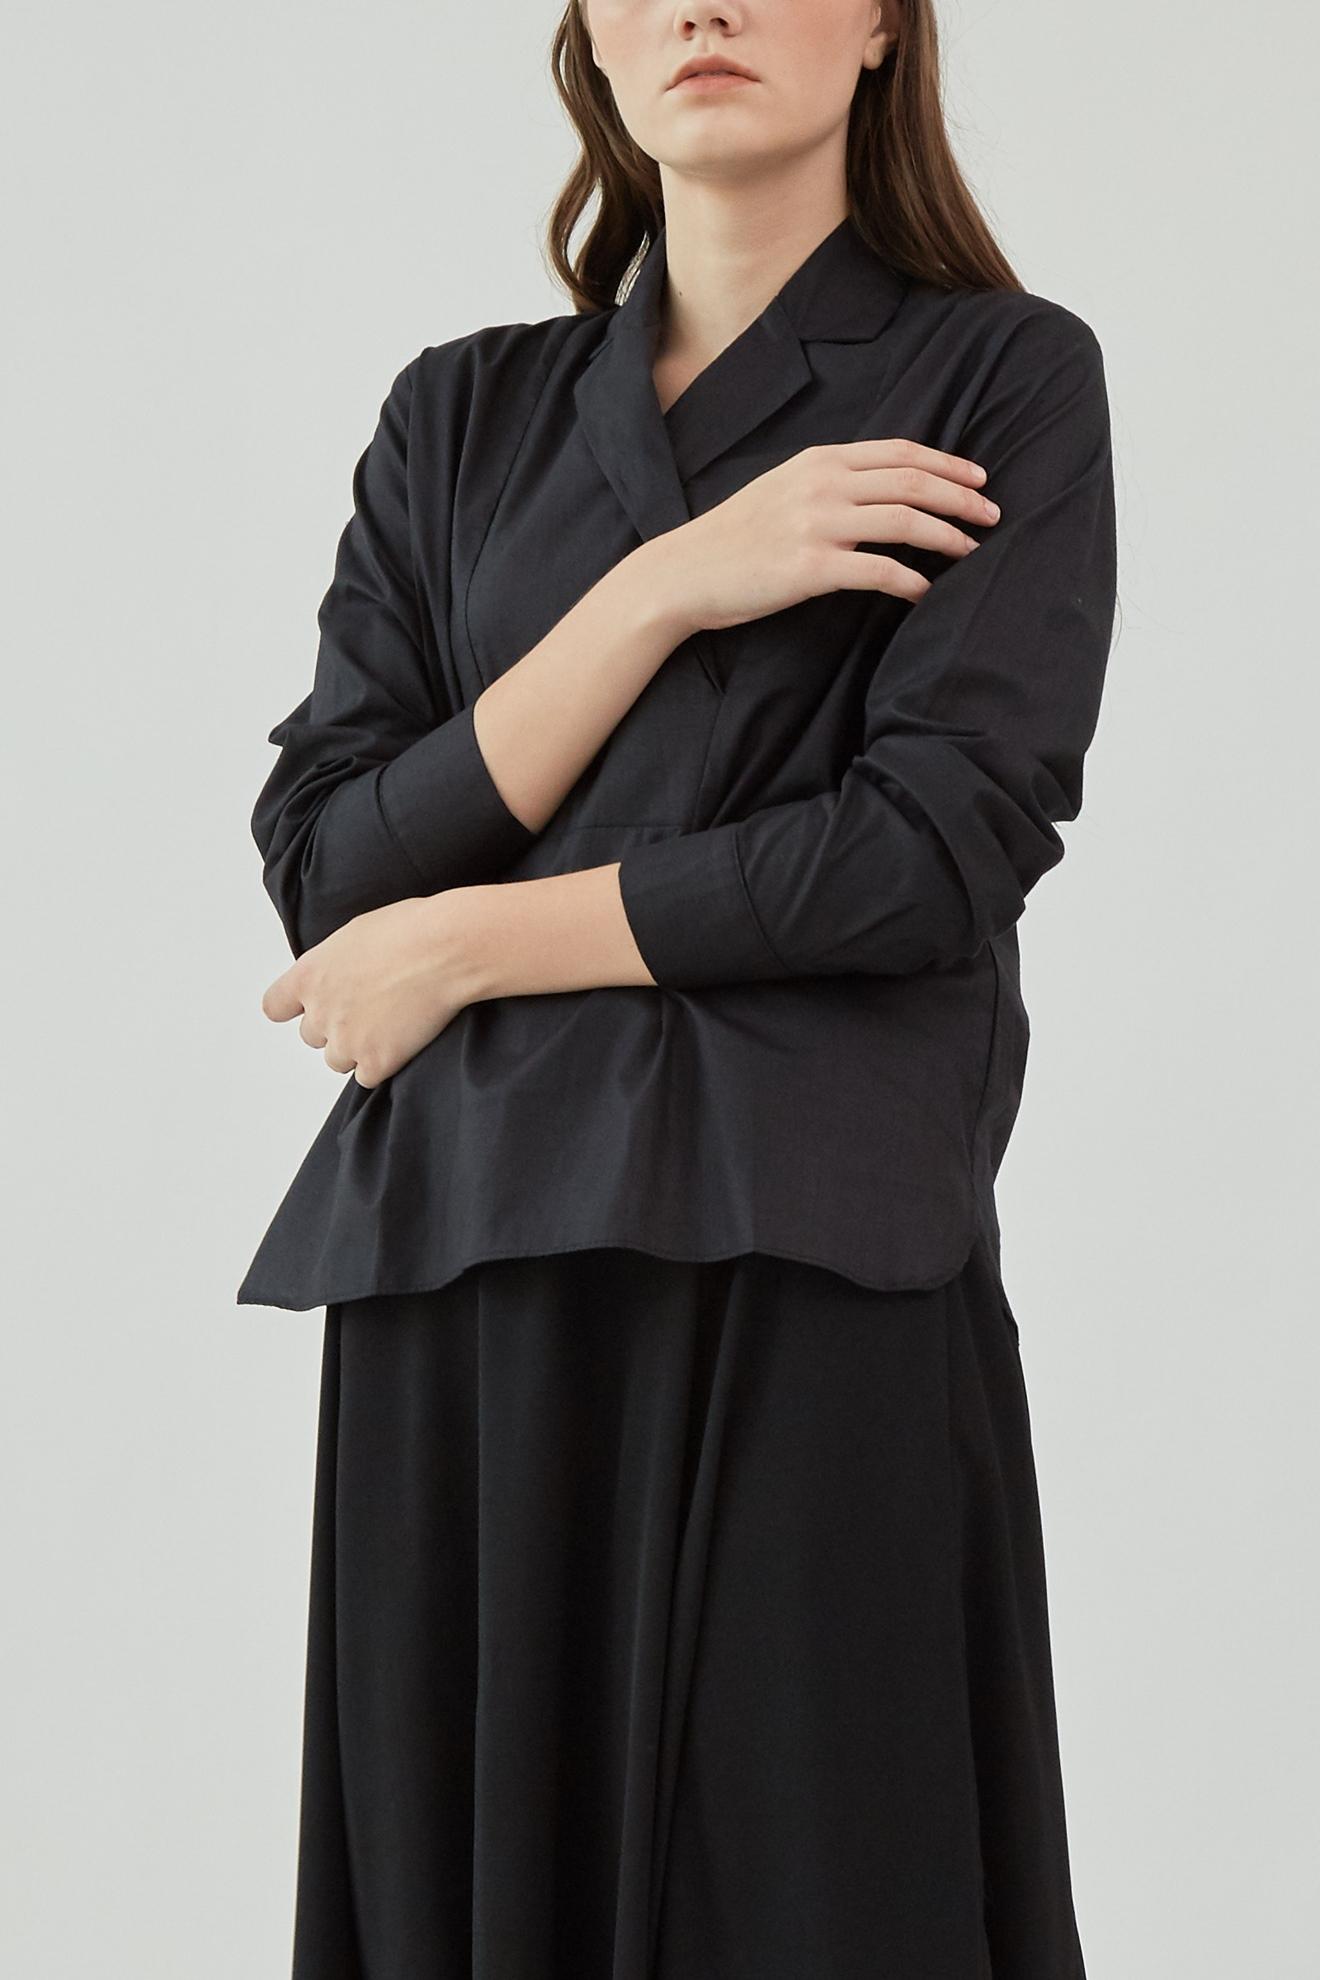 Picture of Valeska Blouse Black